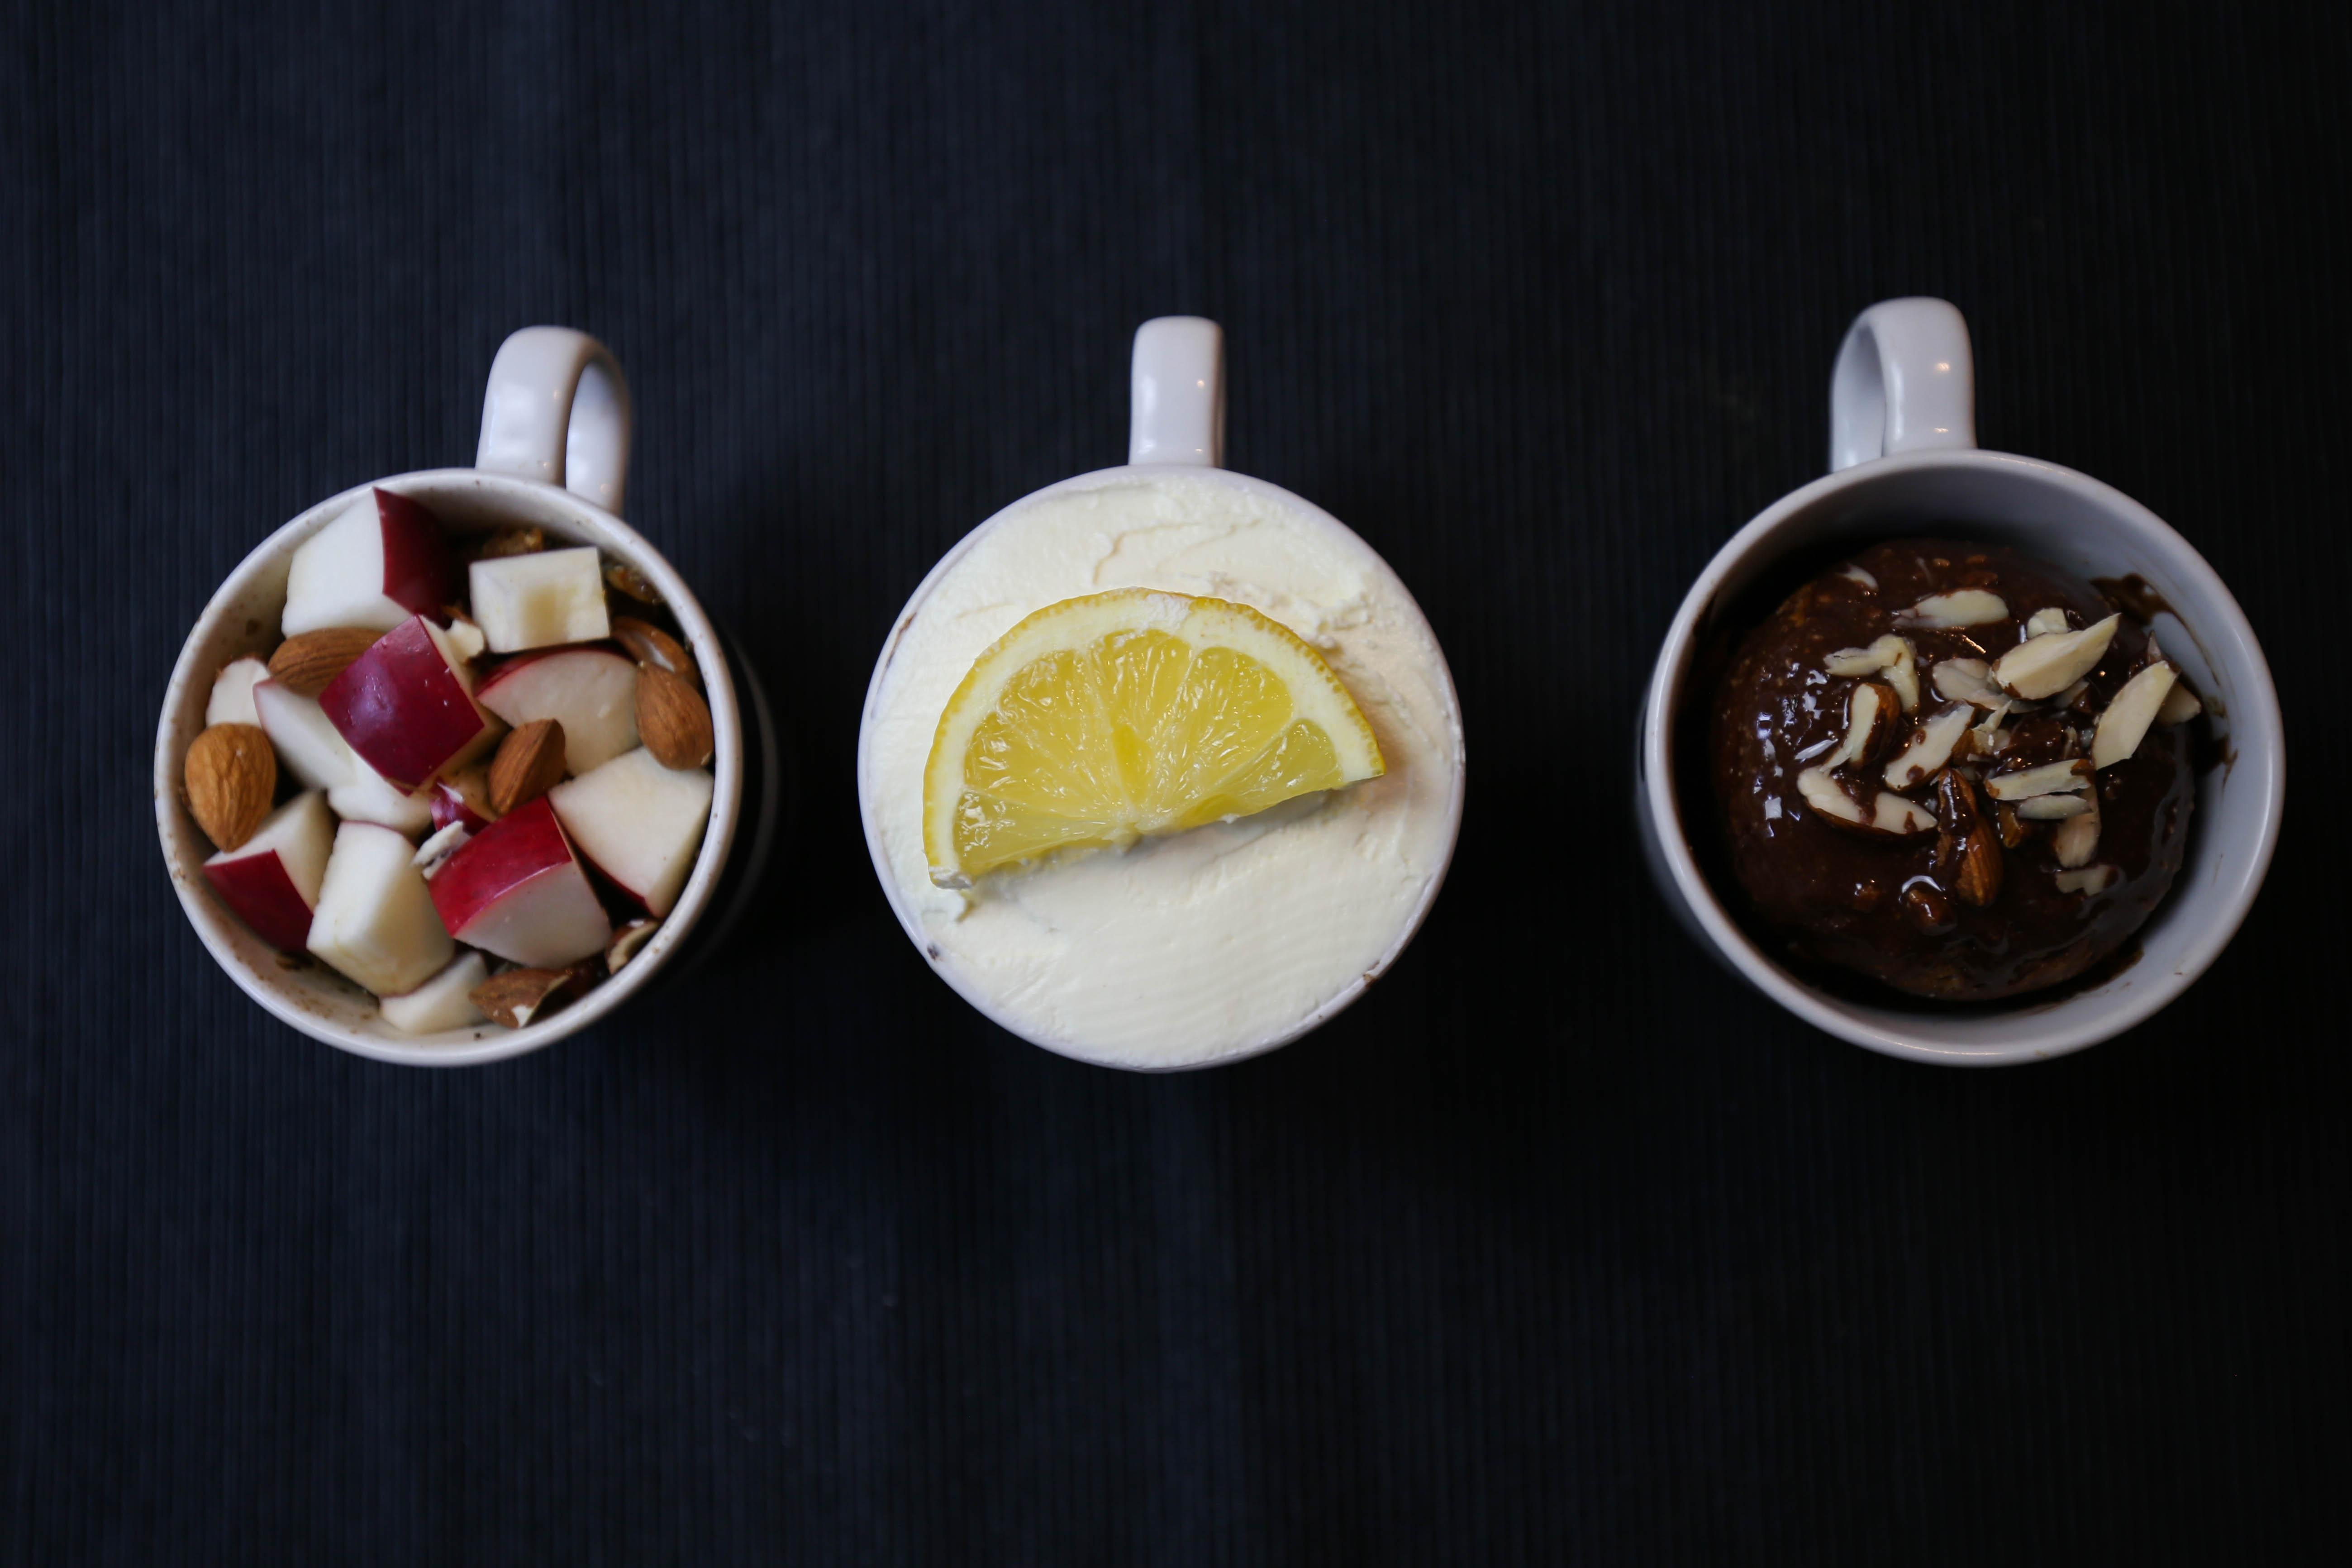 Rezept: gesunde Tassenkuchen